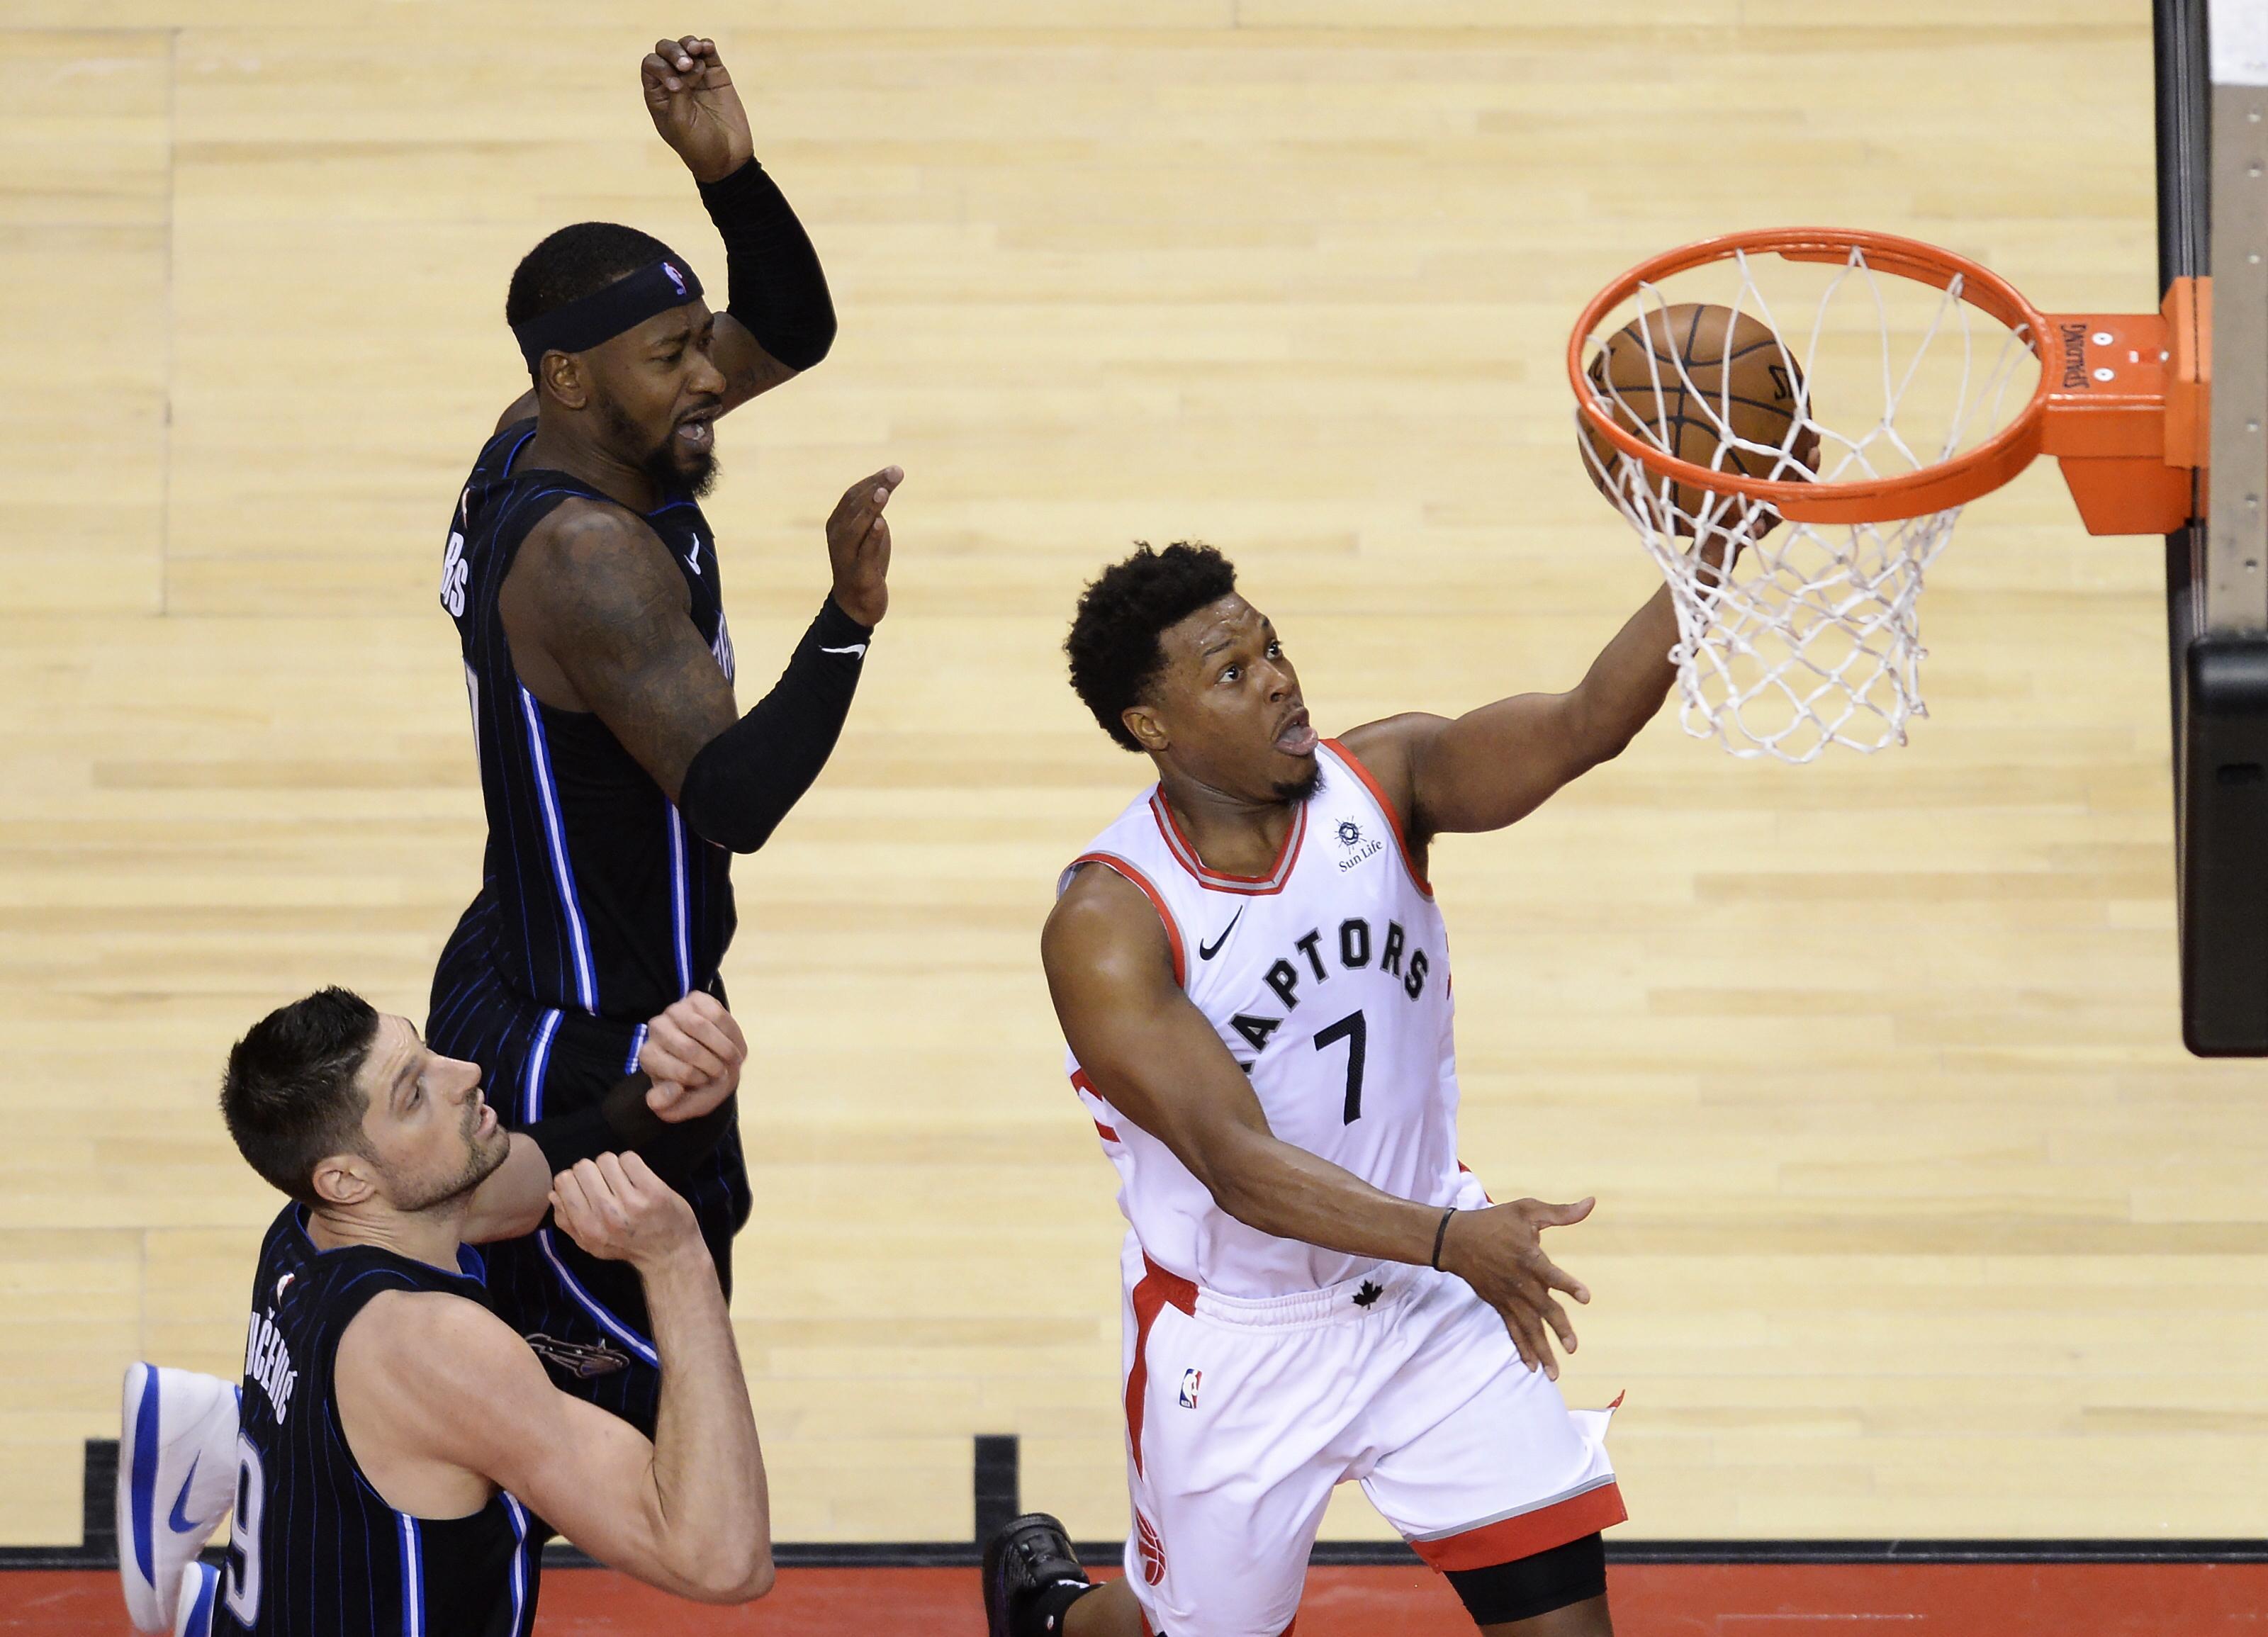 7a0937df999 Toronto Raptors guard Kyle Lowry (7) scores past Orlando Magic center  Nikola Vucevic (